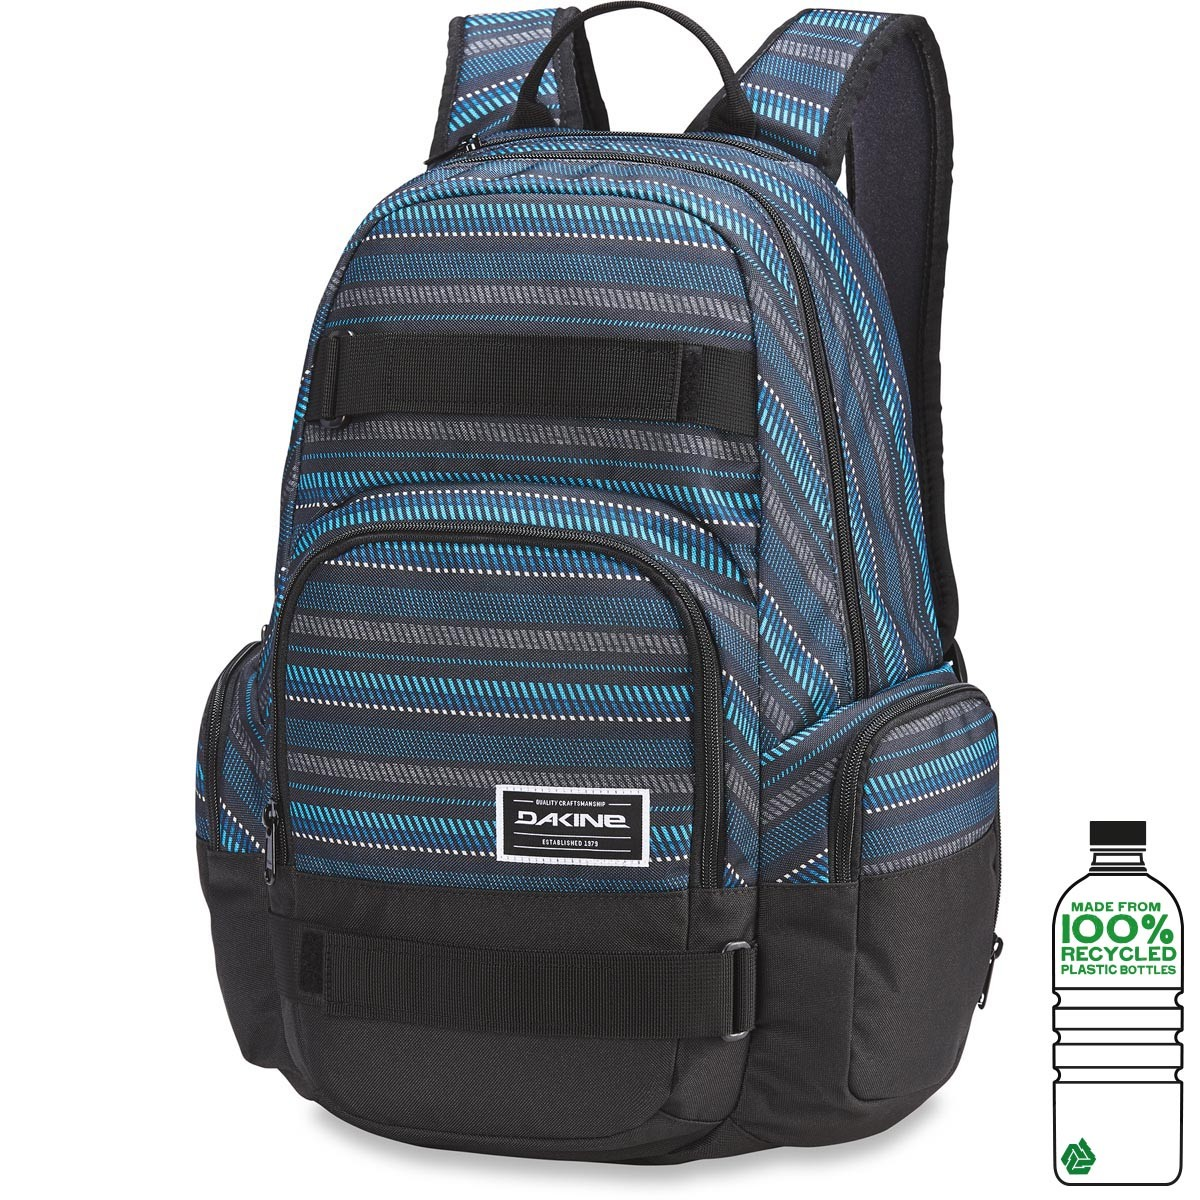 8e453800bc244 Dakine Atlas 25L Backpack Ventana